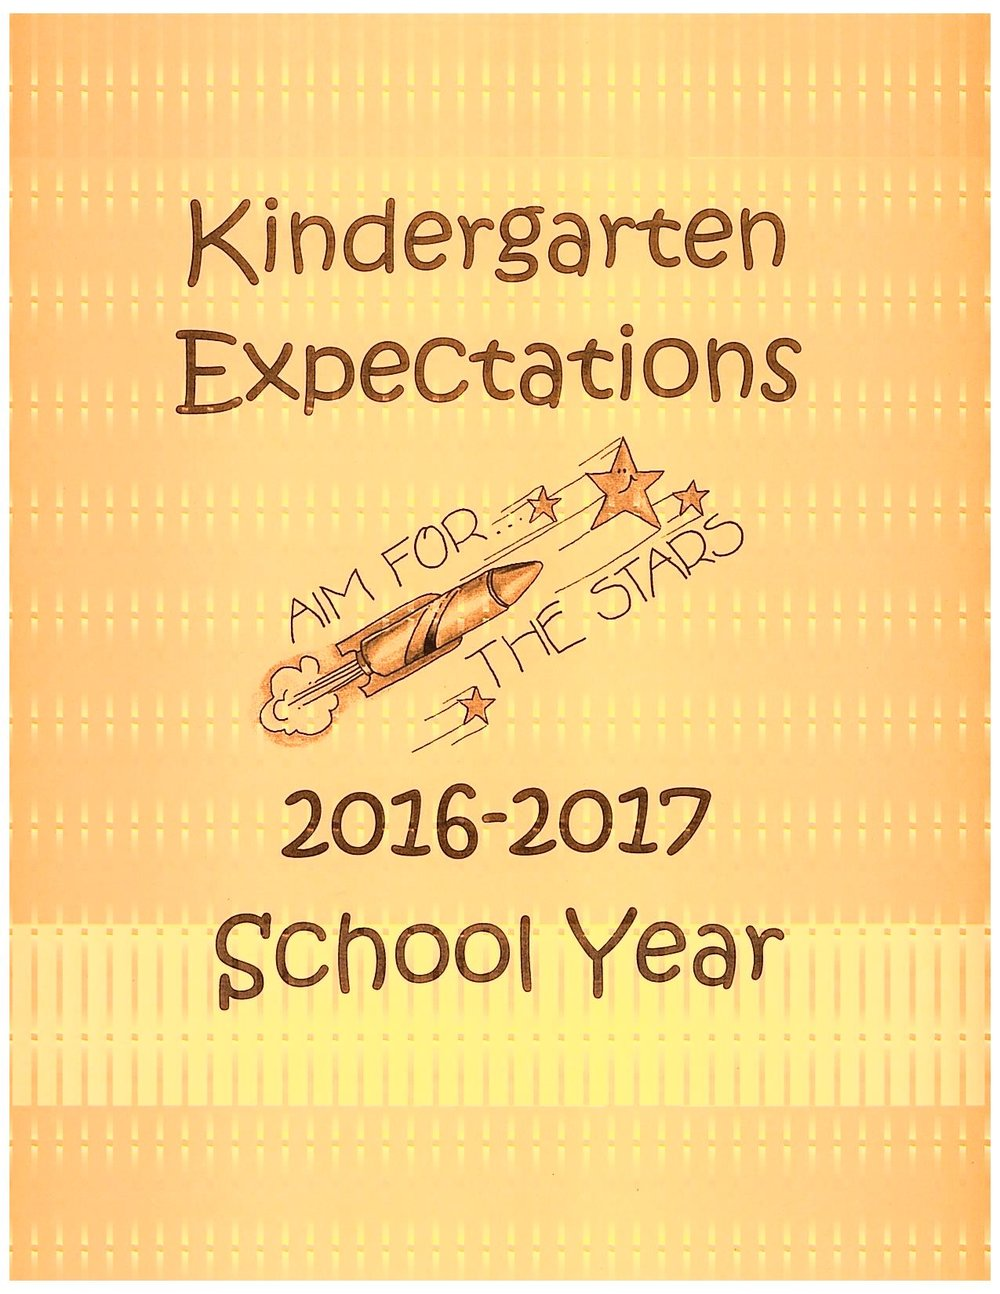 Kindergarden expectations